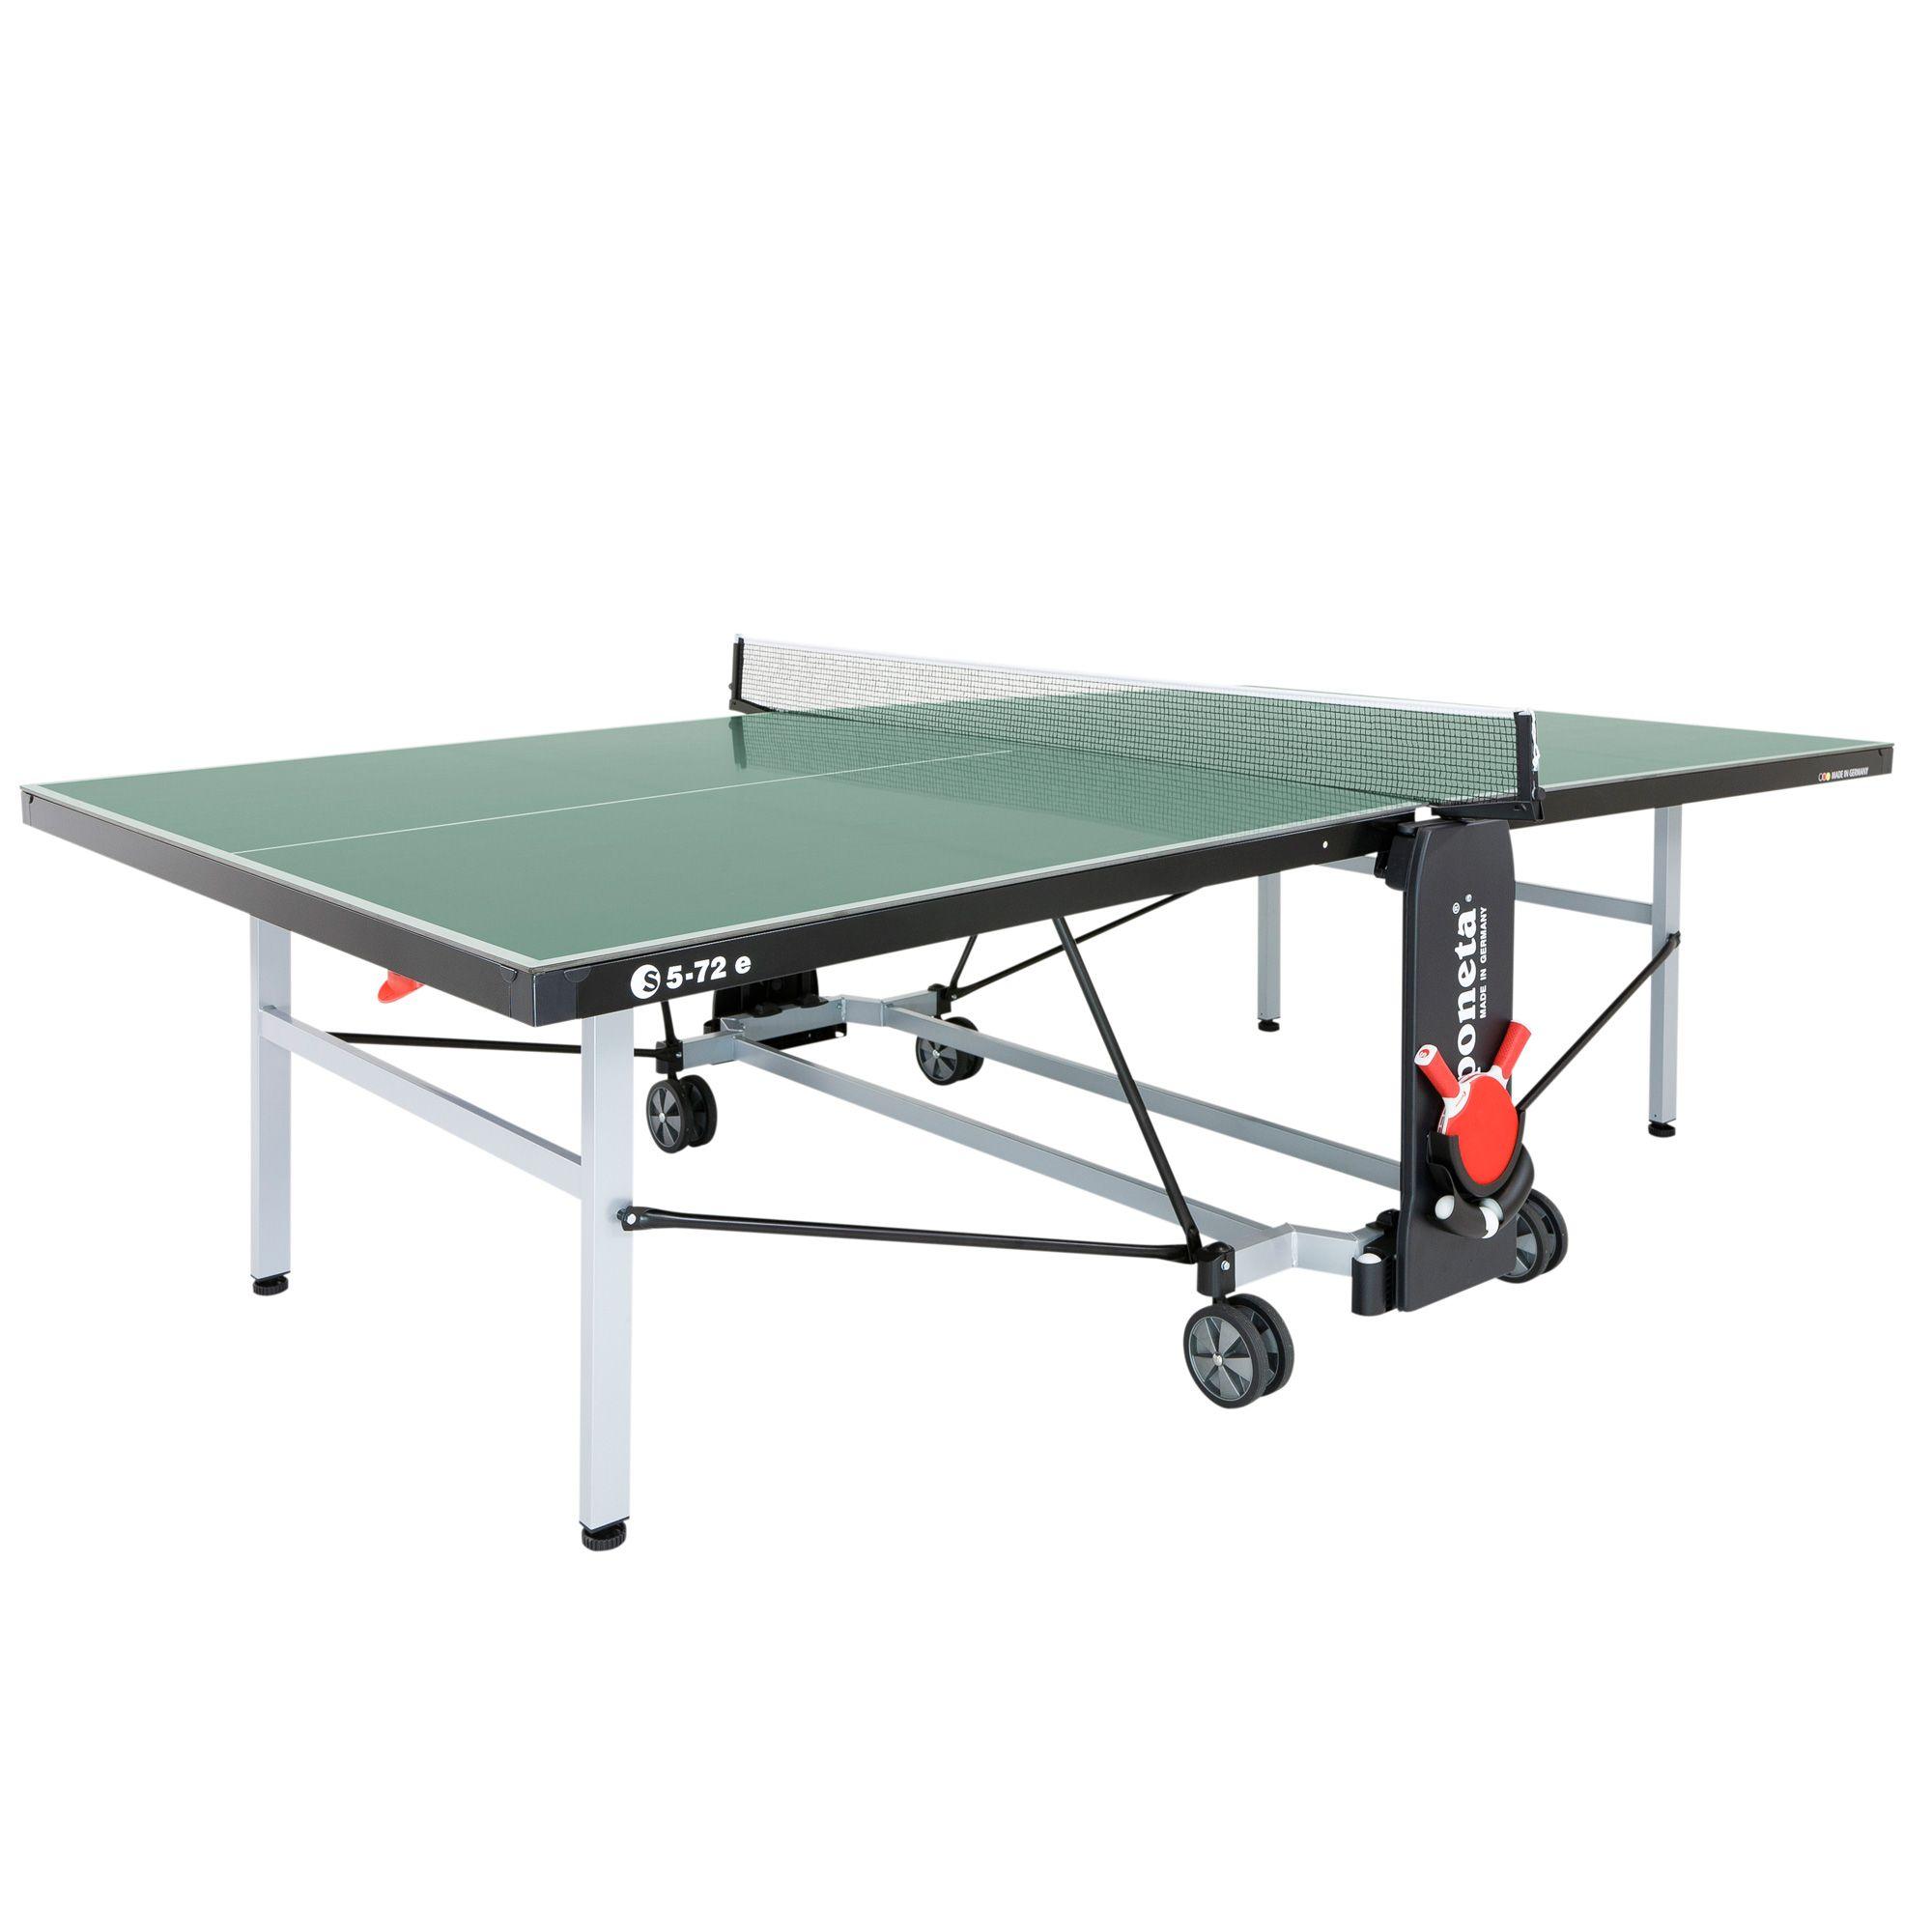 Sponeta deluxe outdoor table tennis table - Sponeta table tennis table ...